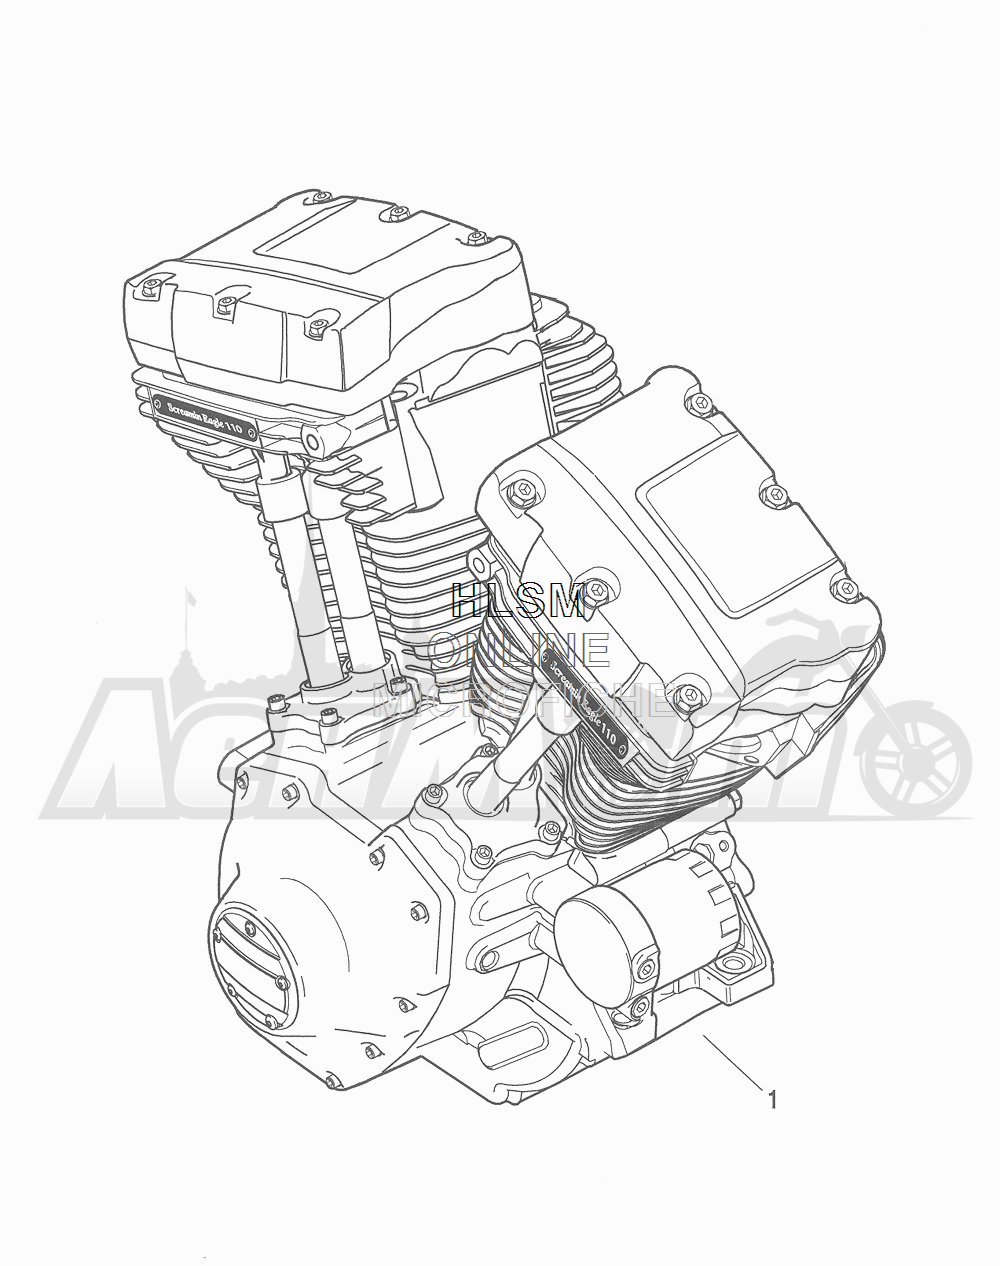 Запчасти для Мотоцикла Harley-Davidson 2016 CVO ROAD GLIDE ULTRA (TA) Раздел: ENGINE ASSEMBLY   двигатель в сборе